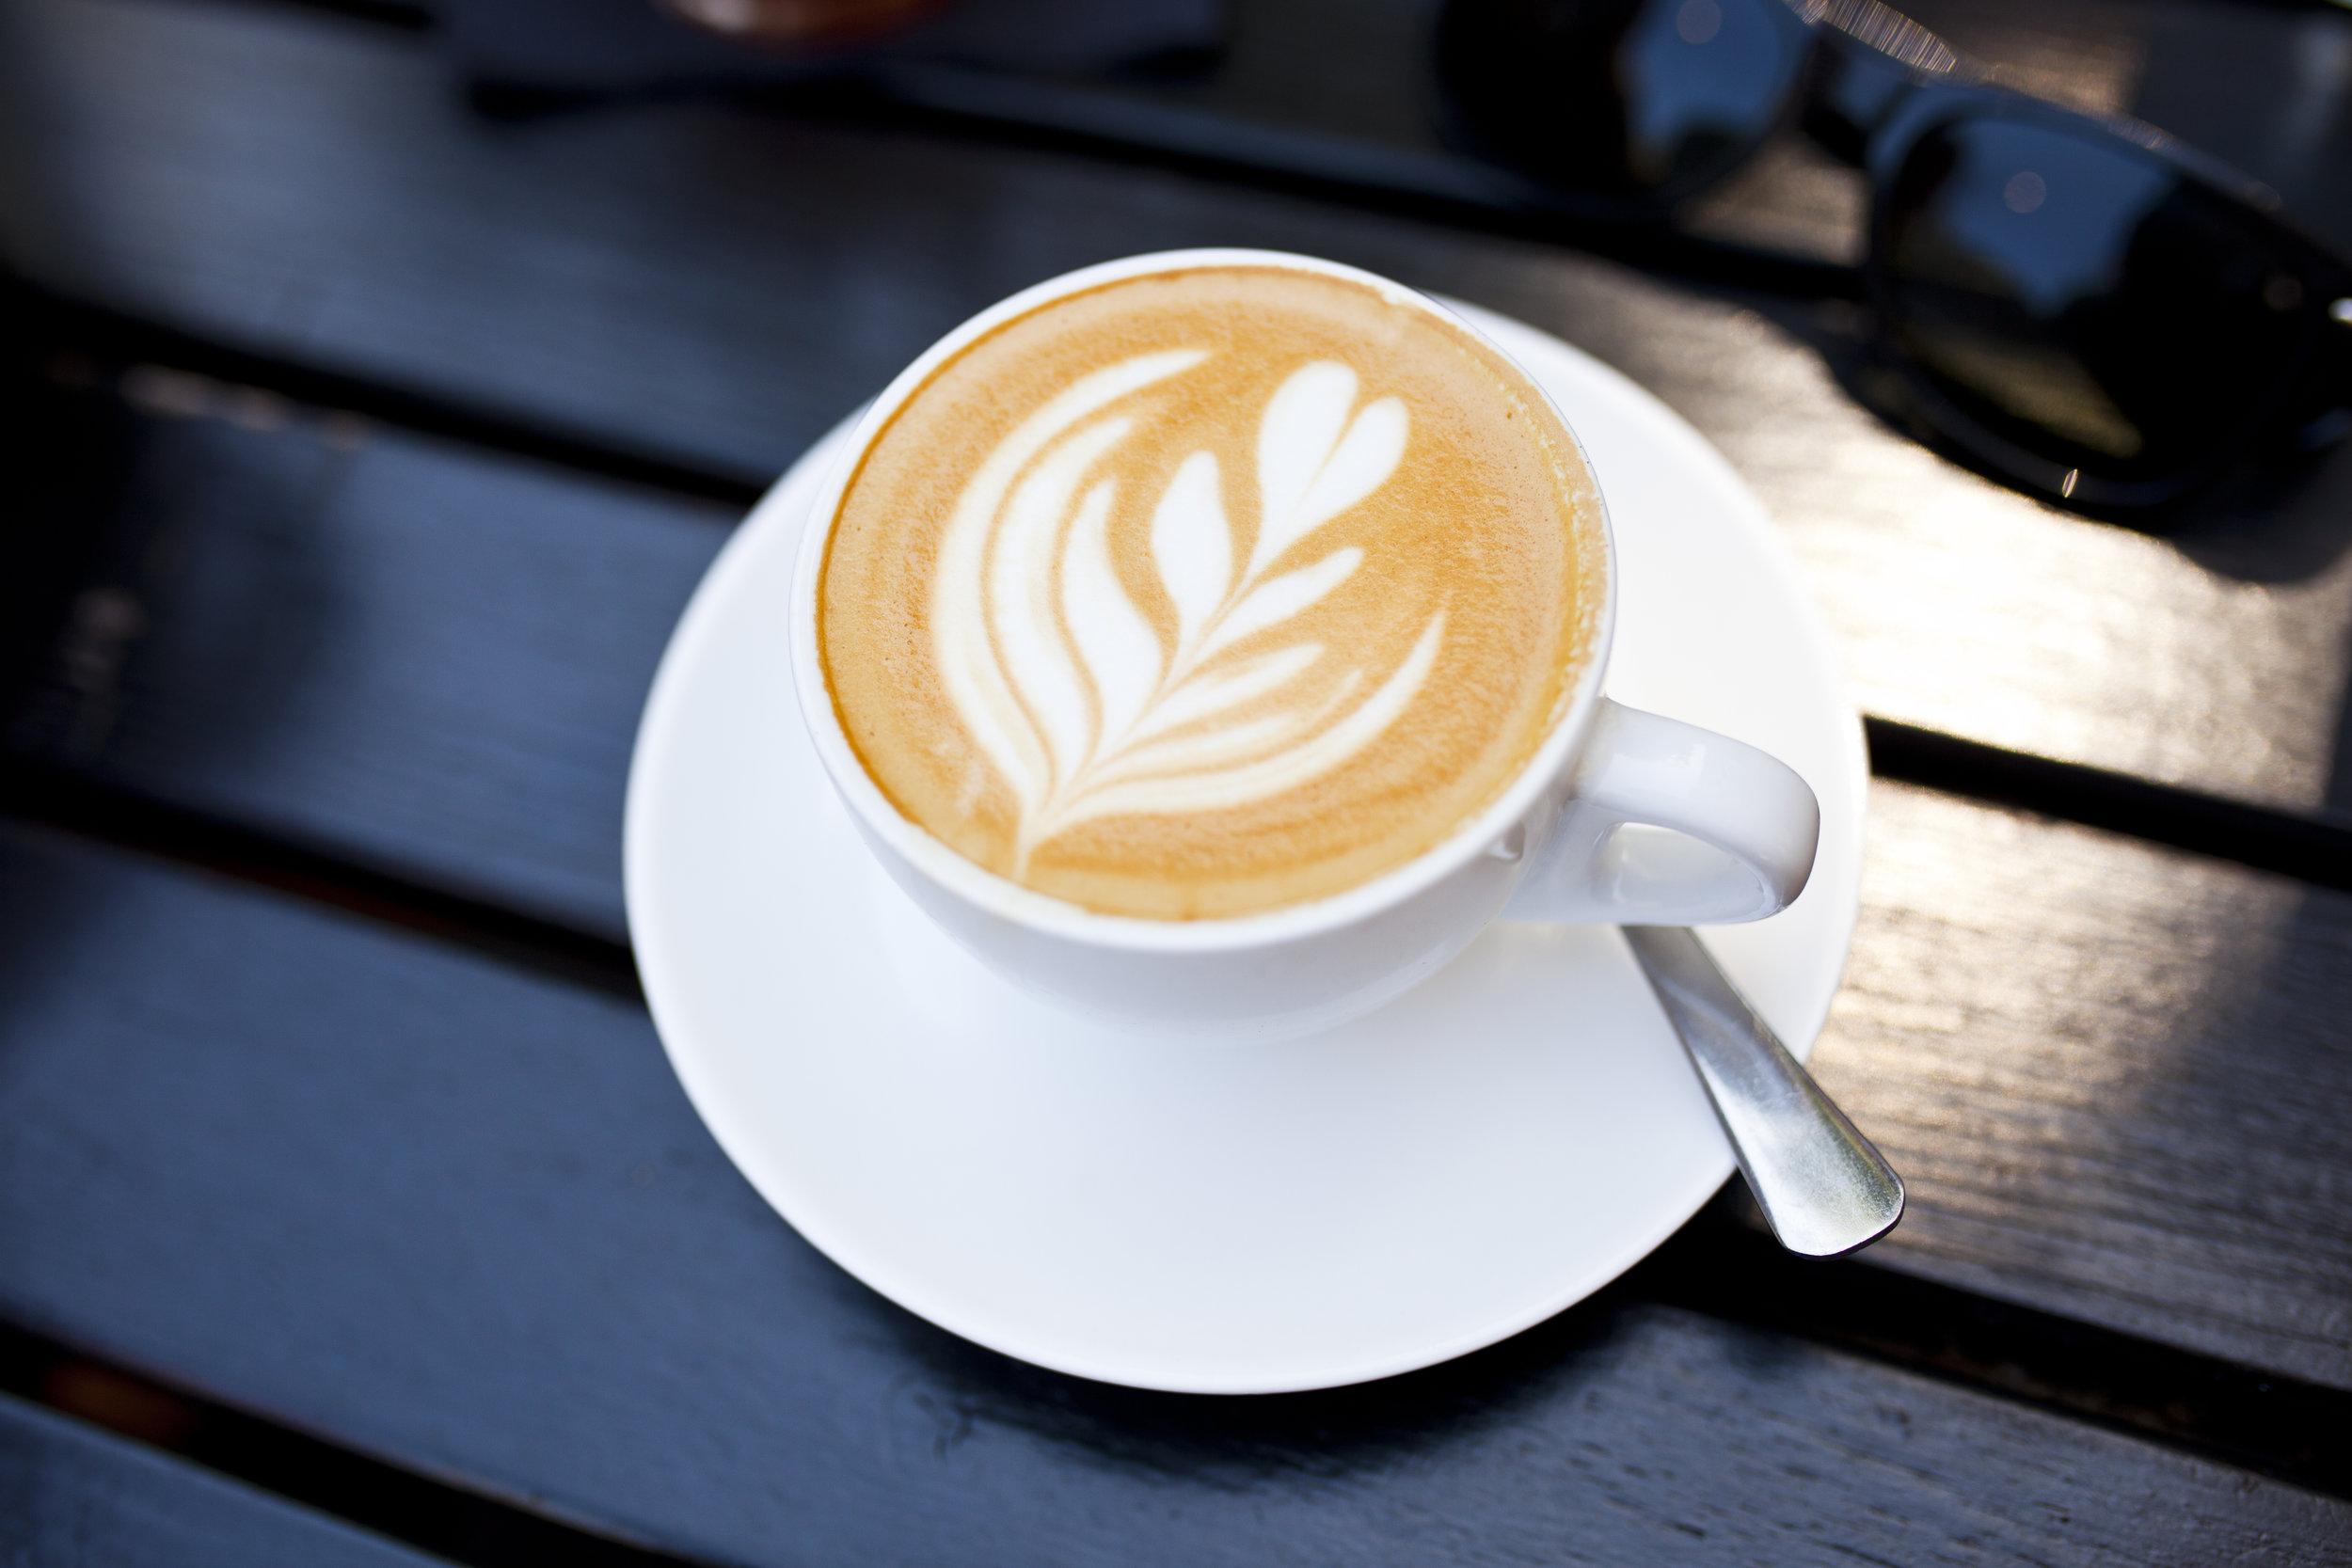 cappuccino2 Ernst.jpg